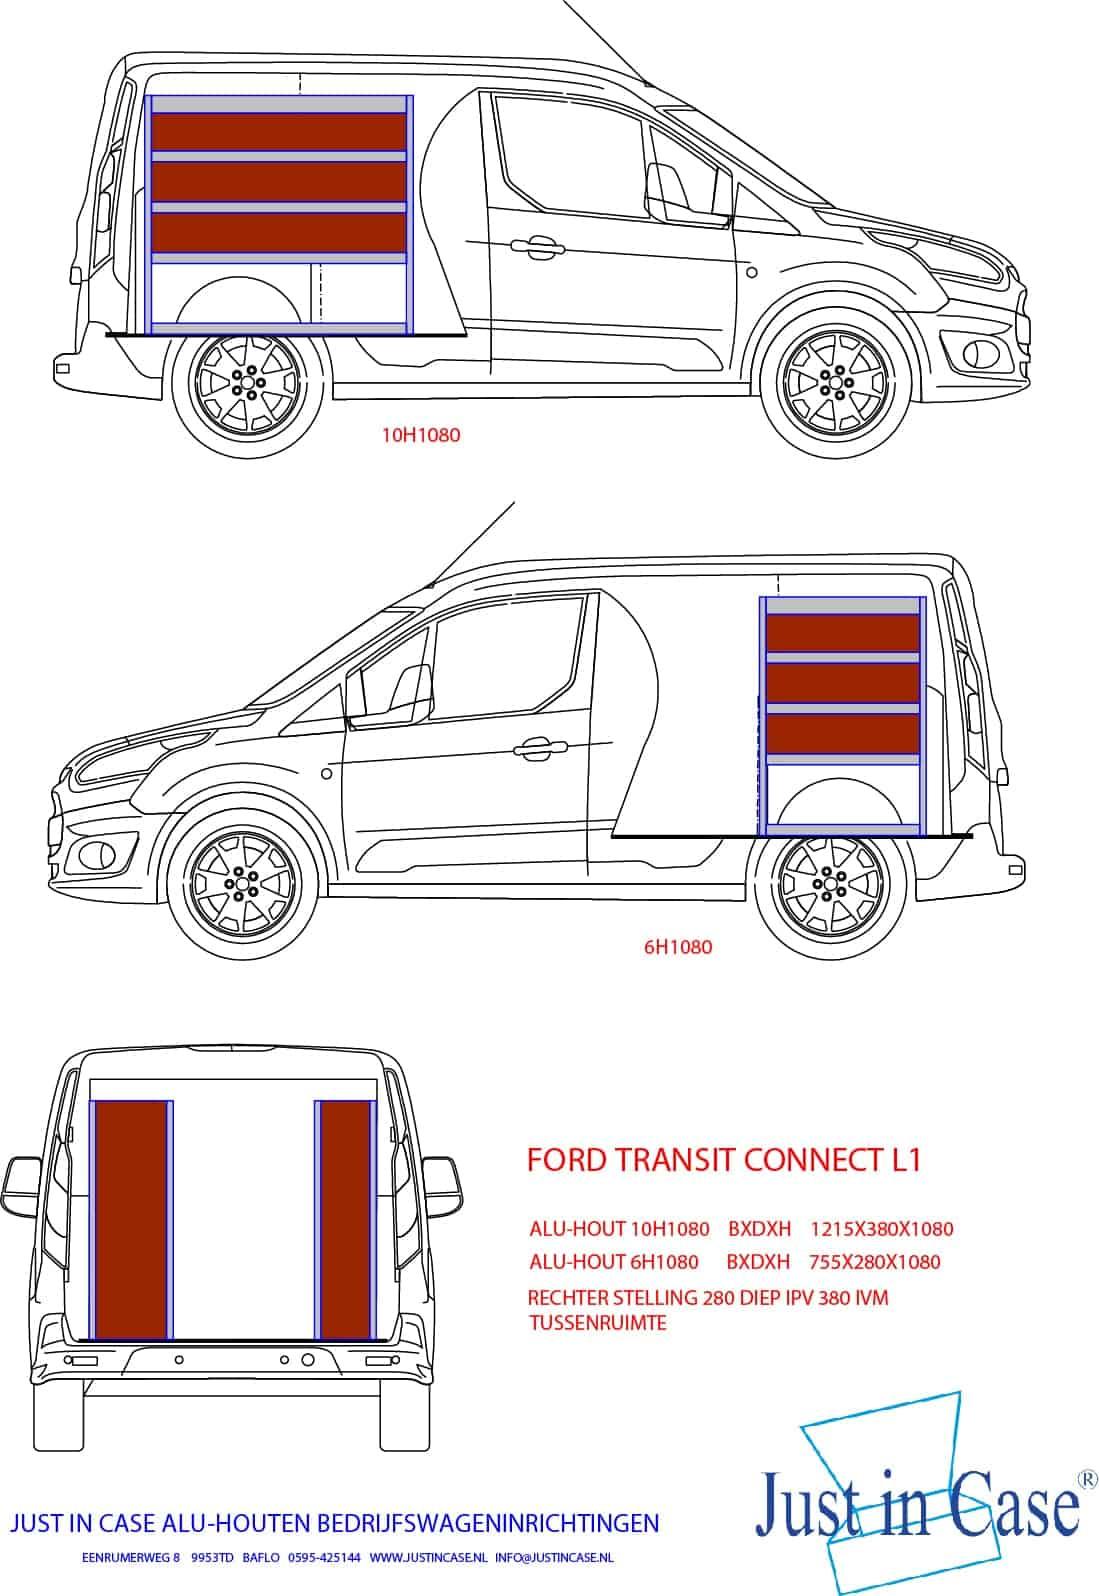 Ford Transit Connect bedrijfswageninrichting